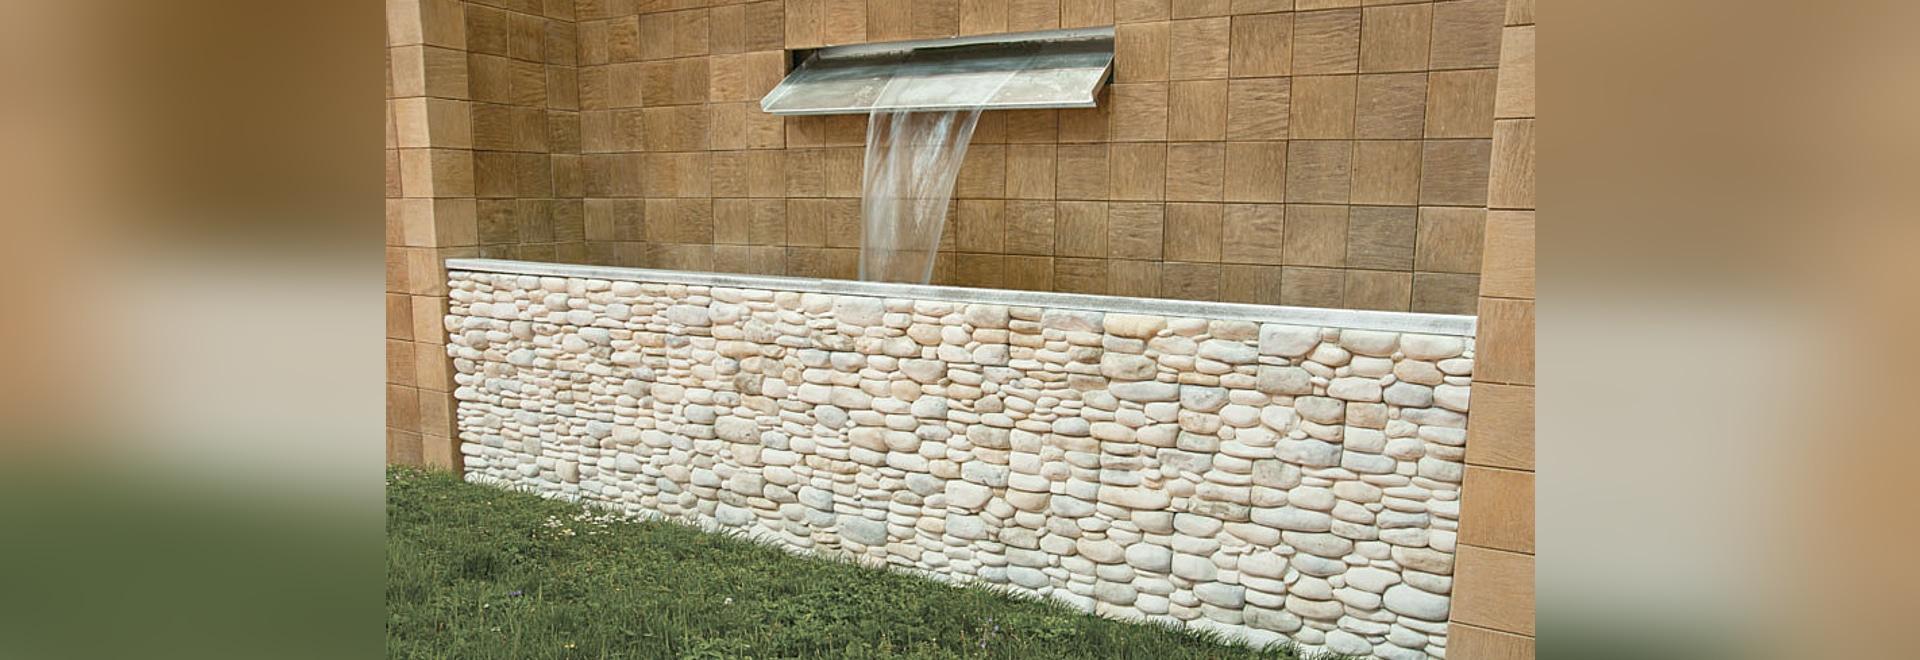 New wall cladding Misuri